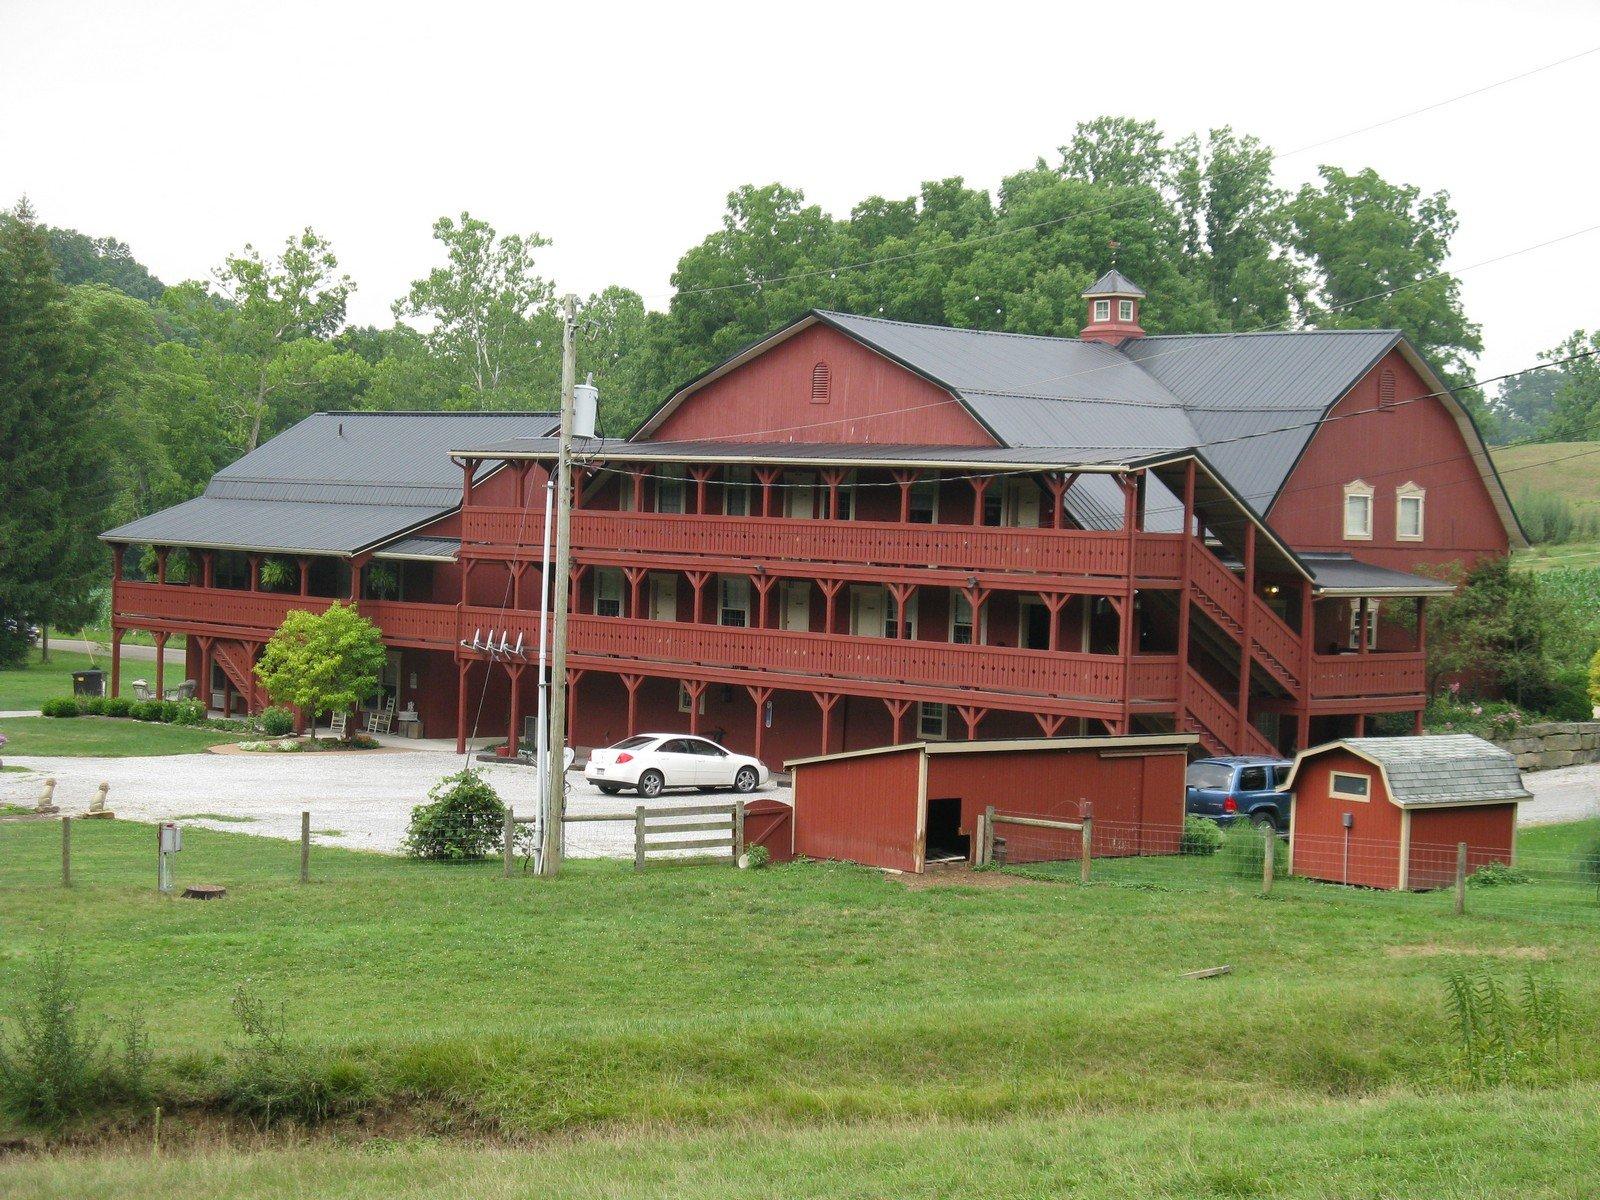 Ohio Barn Bed And Breakfast